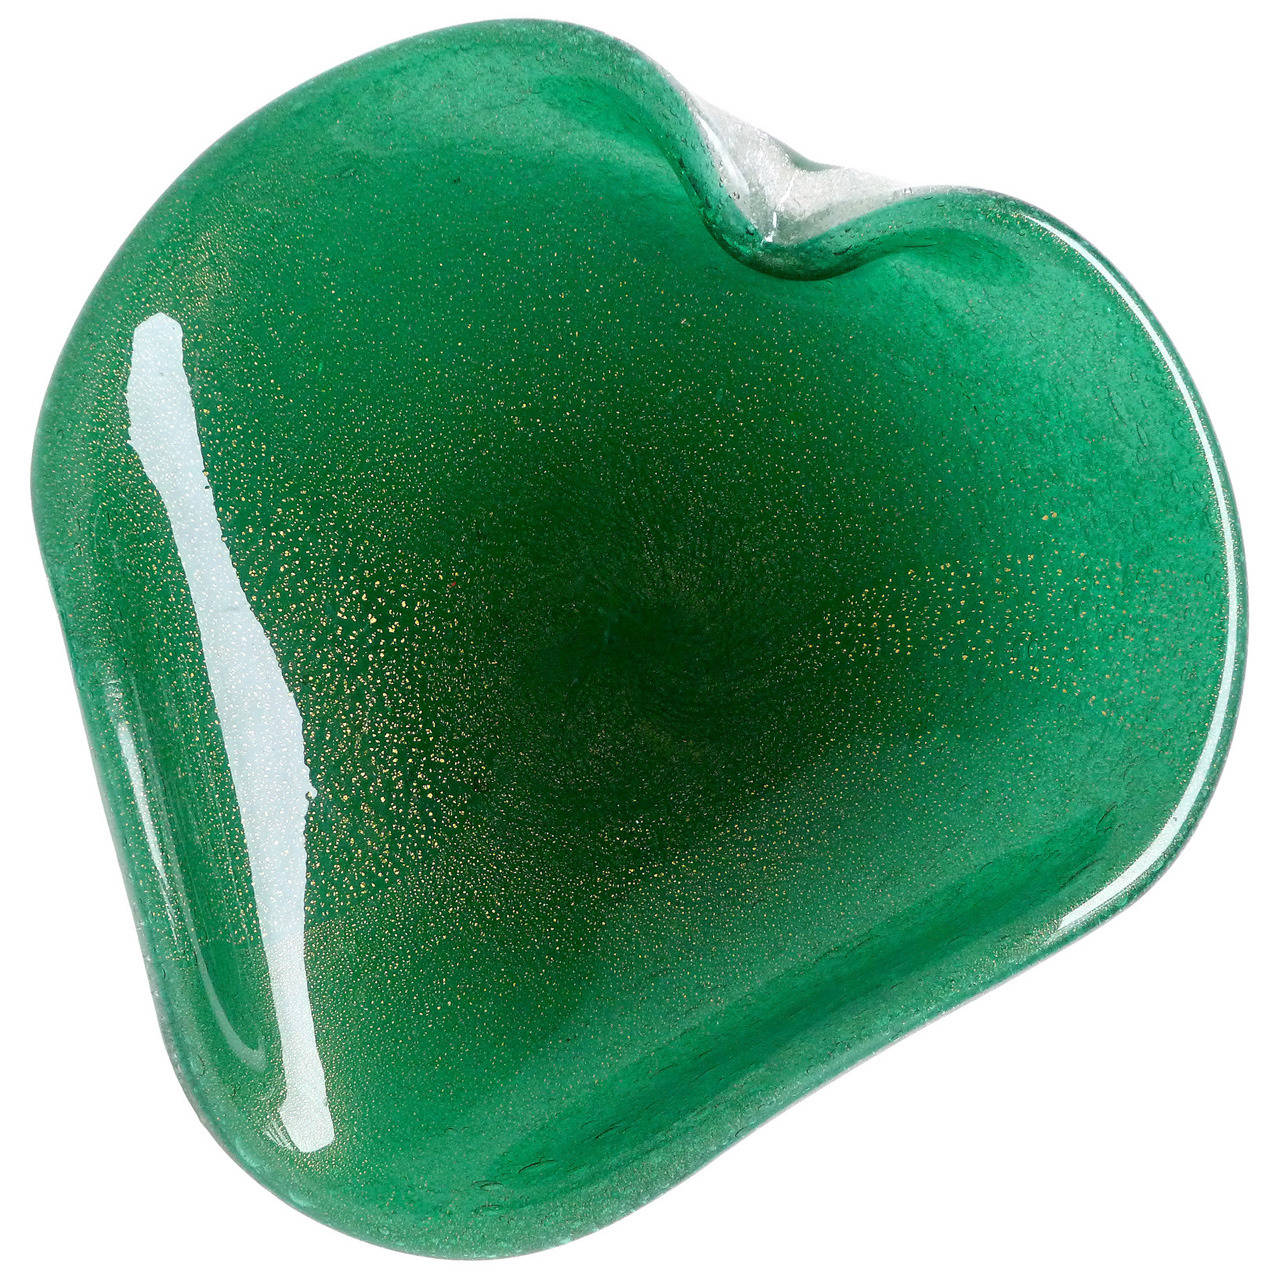 Seguso Vetri D' Arte Murano Gold Flecks, Green Italian Art Glass Heart Bowl